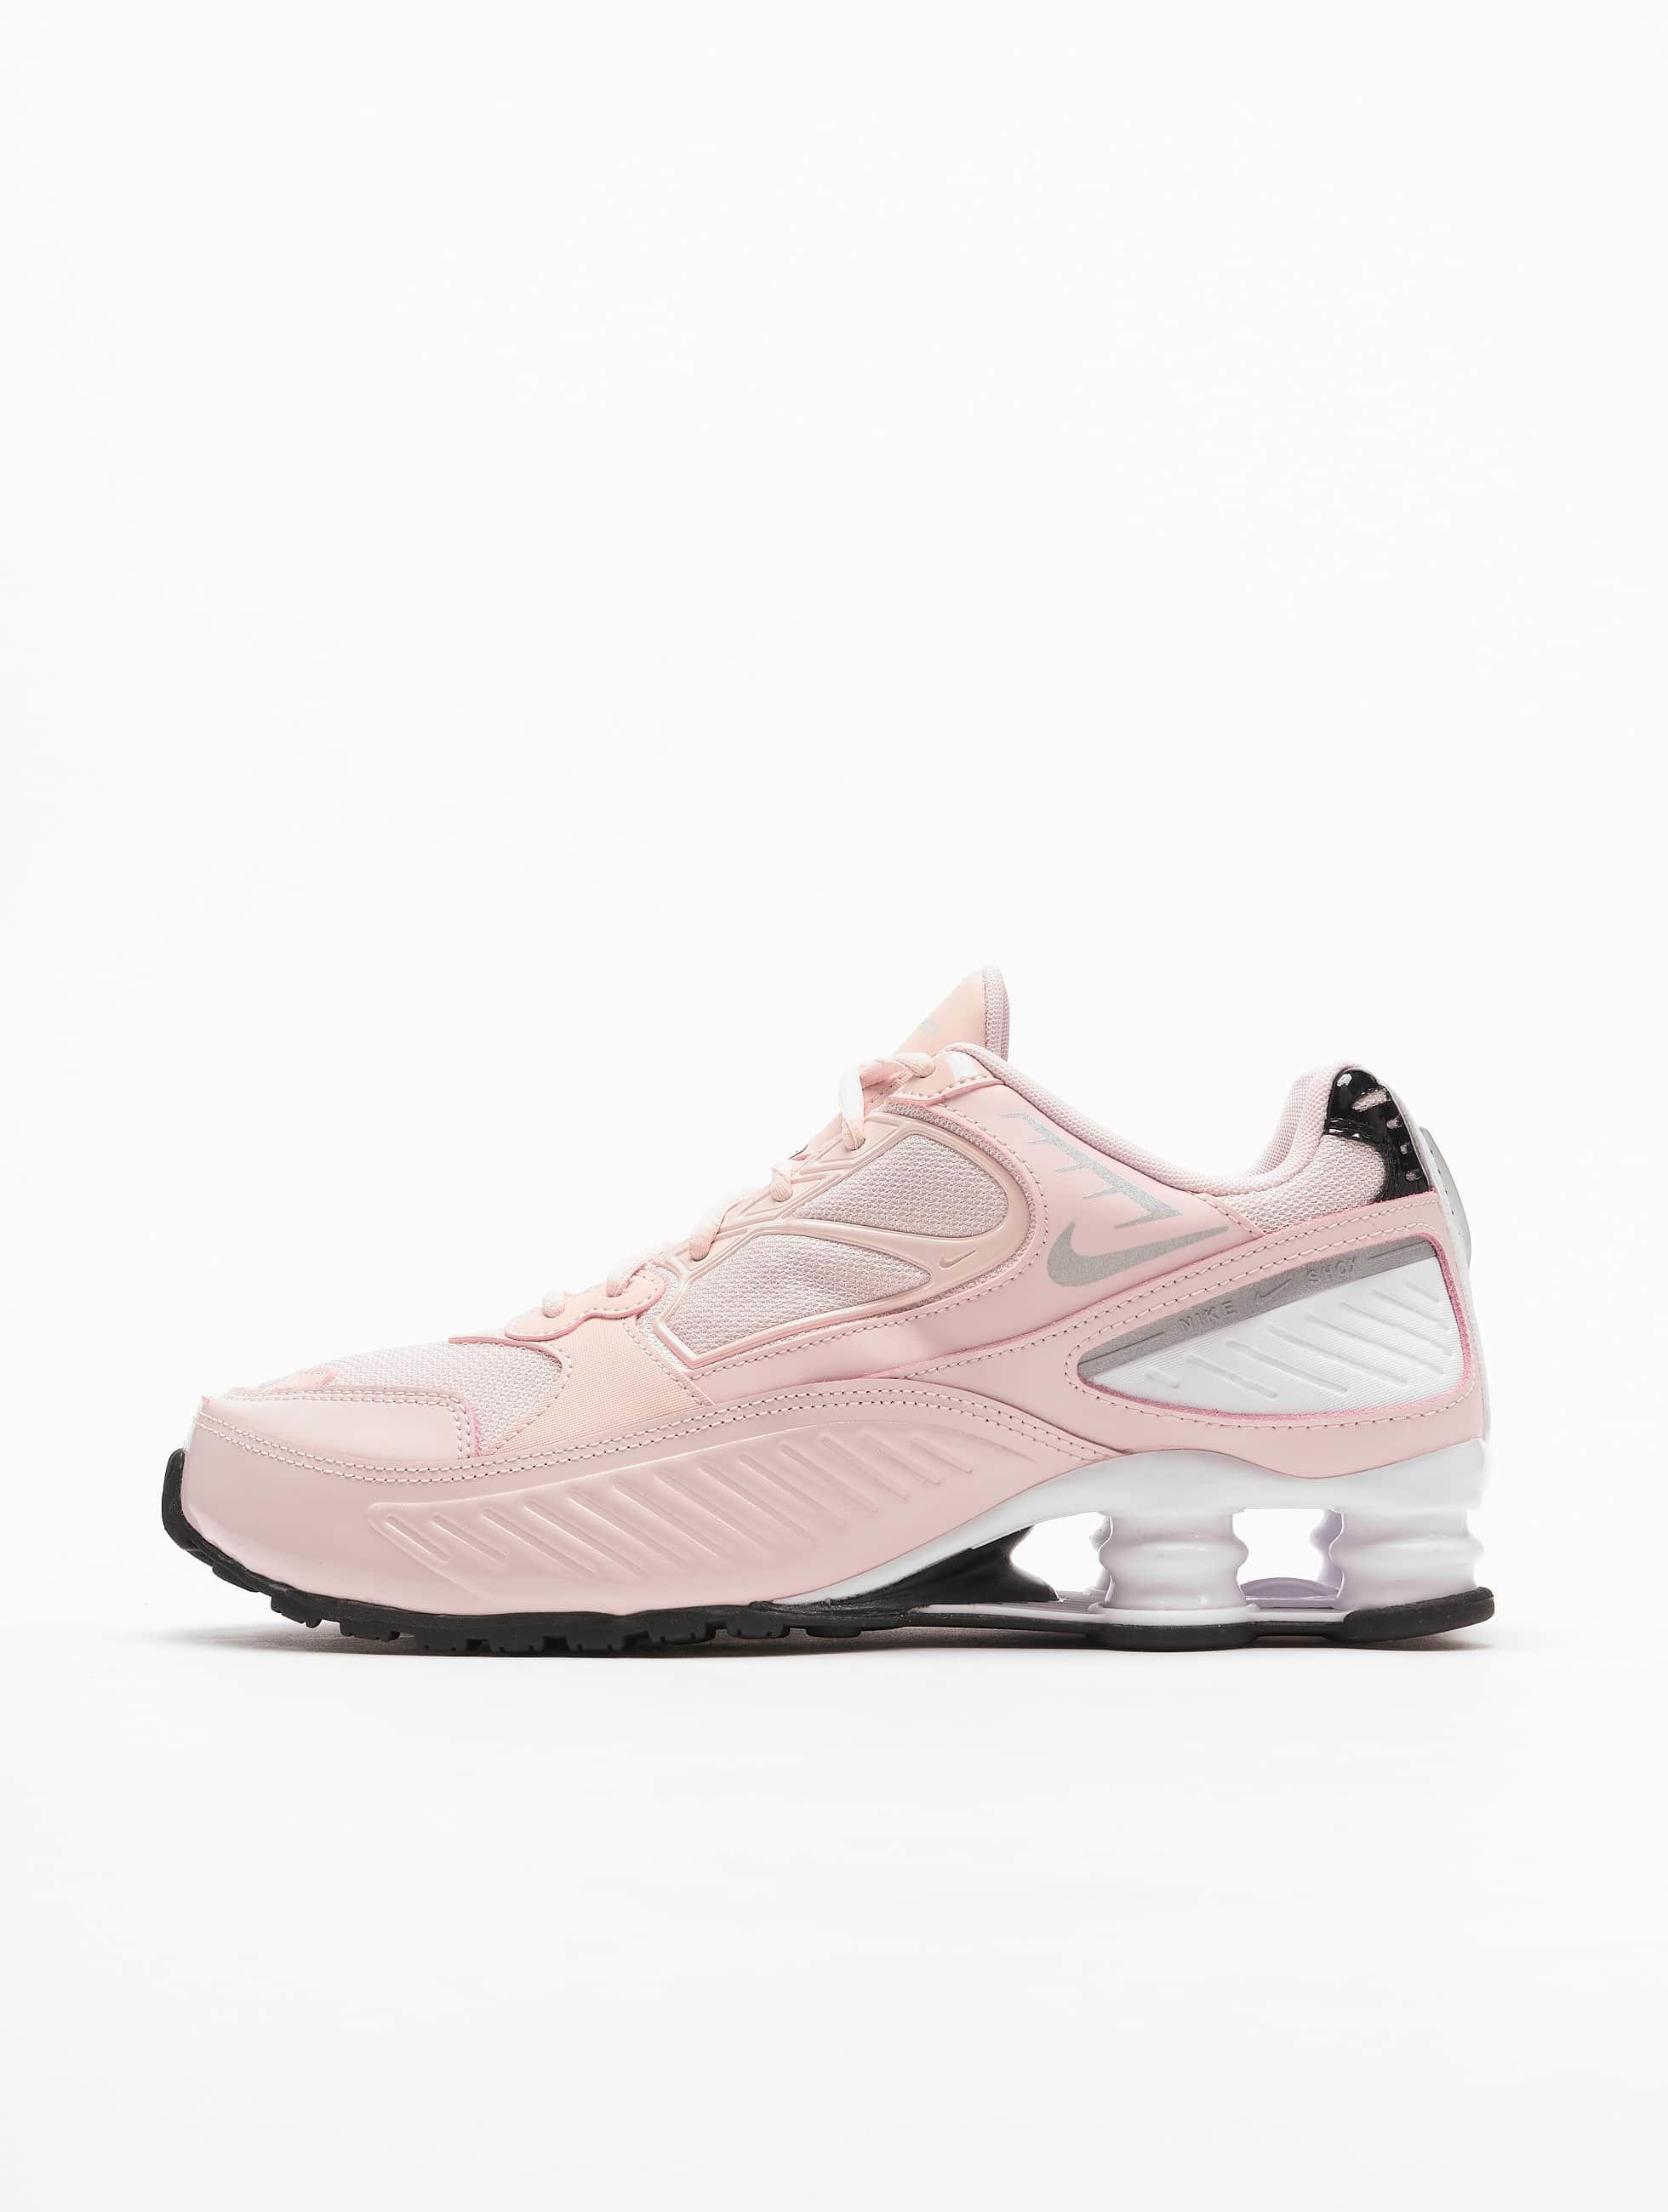 Nike Shox Enigma 9000 Sneakers Barely RoseReflect SilvernBlackWhite